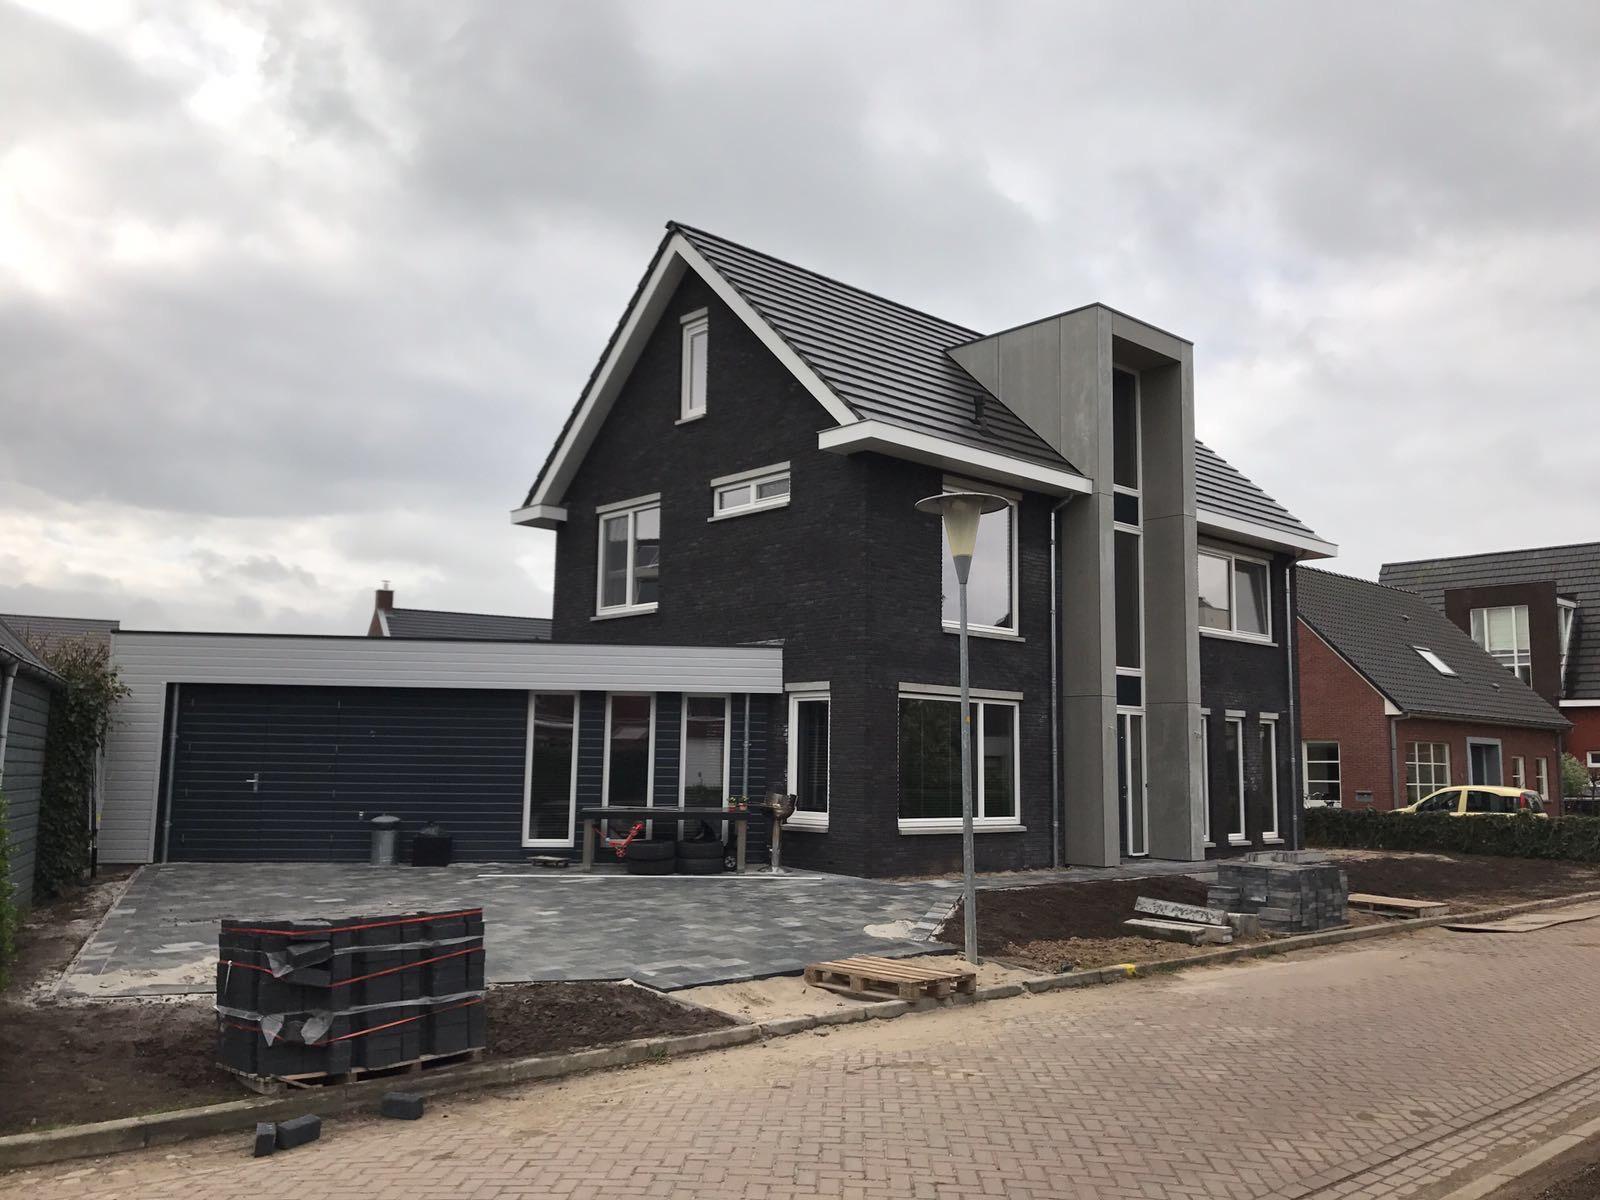 http://uploads.metsander.nl/huis-1-20170727.JPG